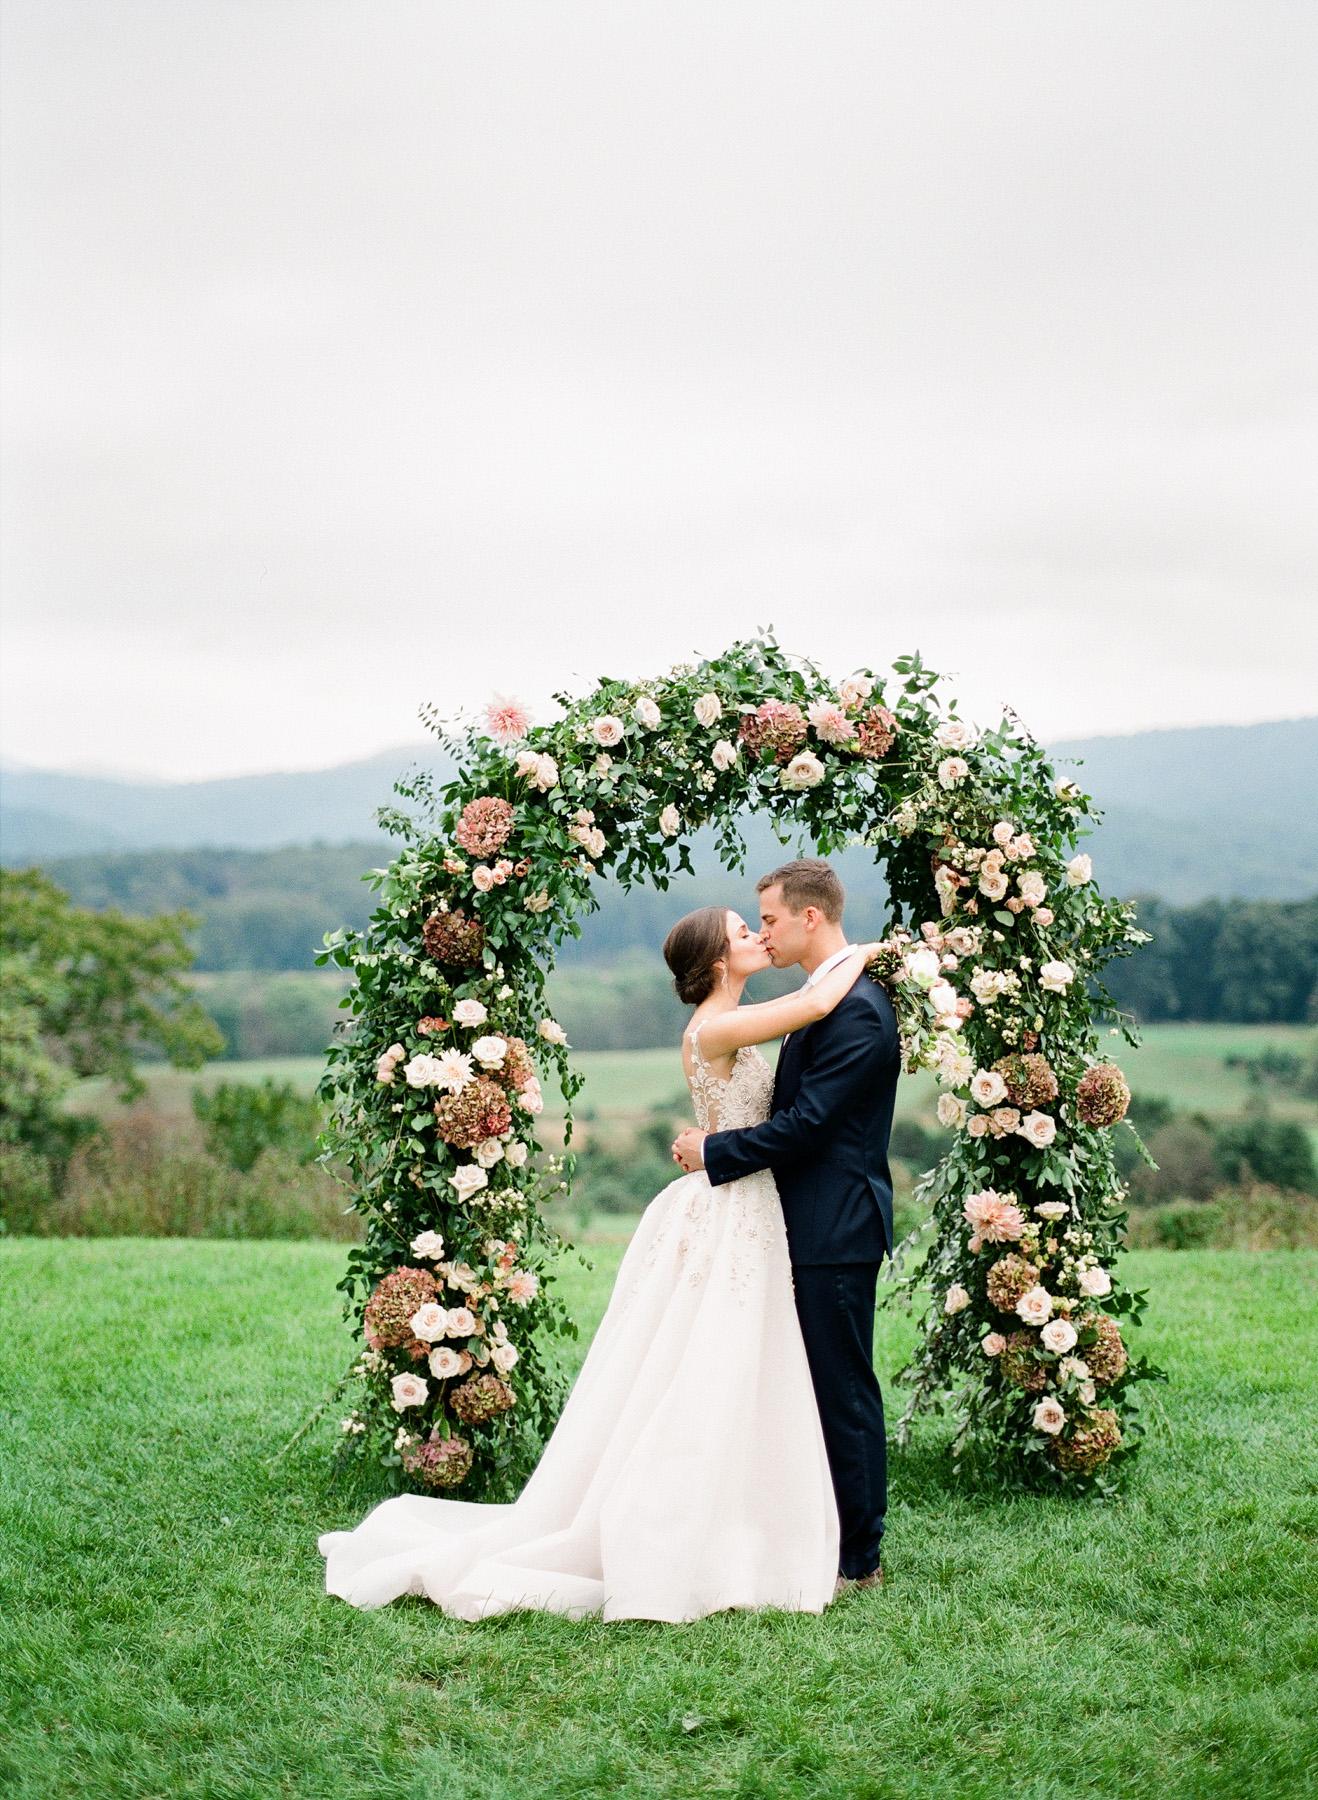 Pippin-Hill-Farm-and-Vinyards-Wedding-Film-Photography-34.jpg